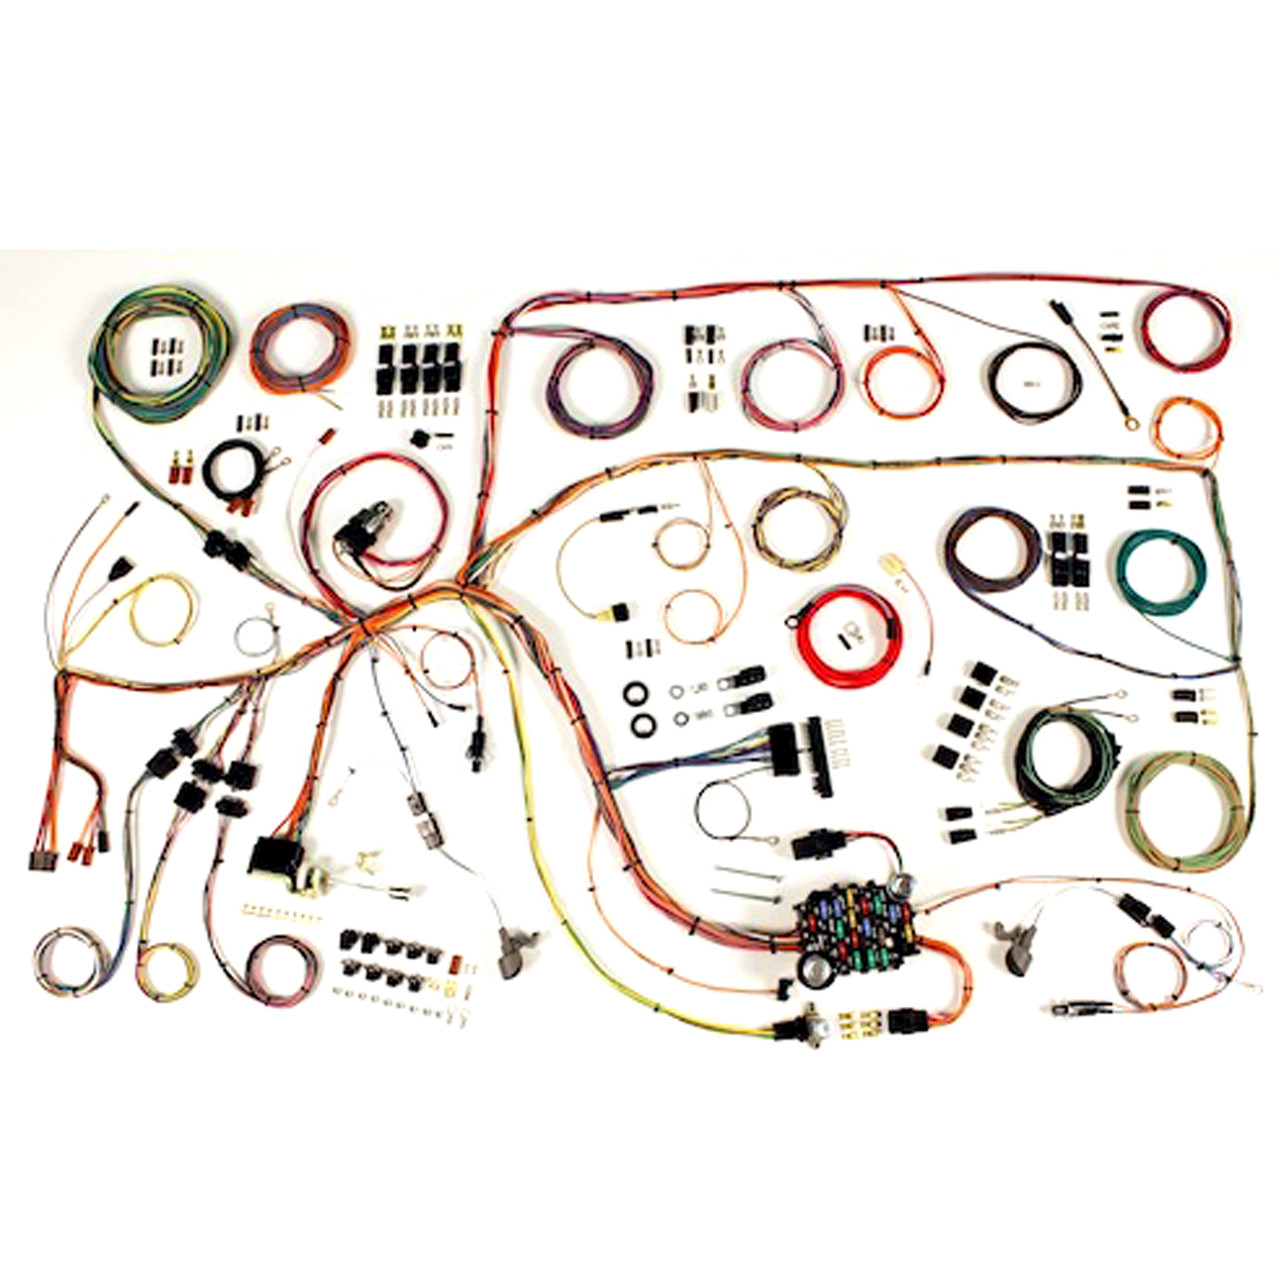 [SCHEMATICS_48EU]  1966 Mercury Comet Wiring Diagram - Wiring Diagram Schemes   1966 Mercury Cyclone Wiring Diagrams      Wiring Diagram Schemes - Mein-Raetien